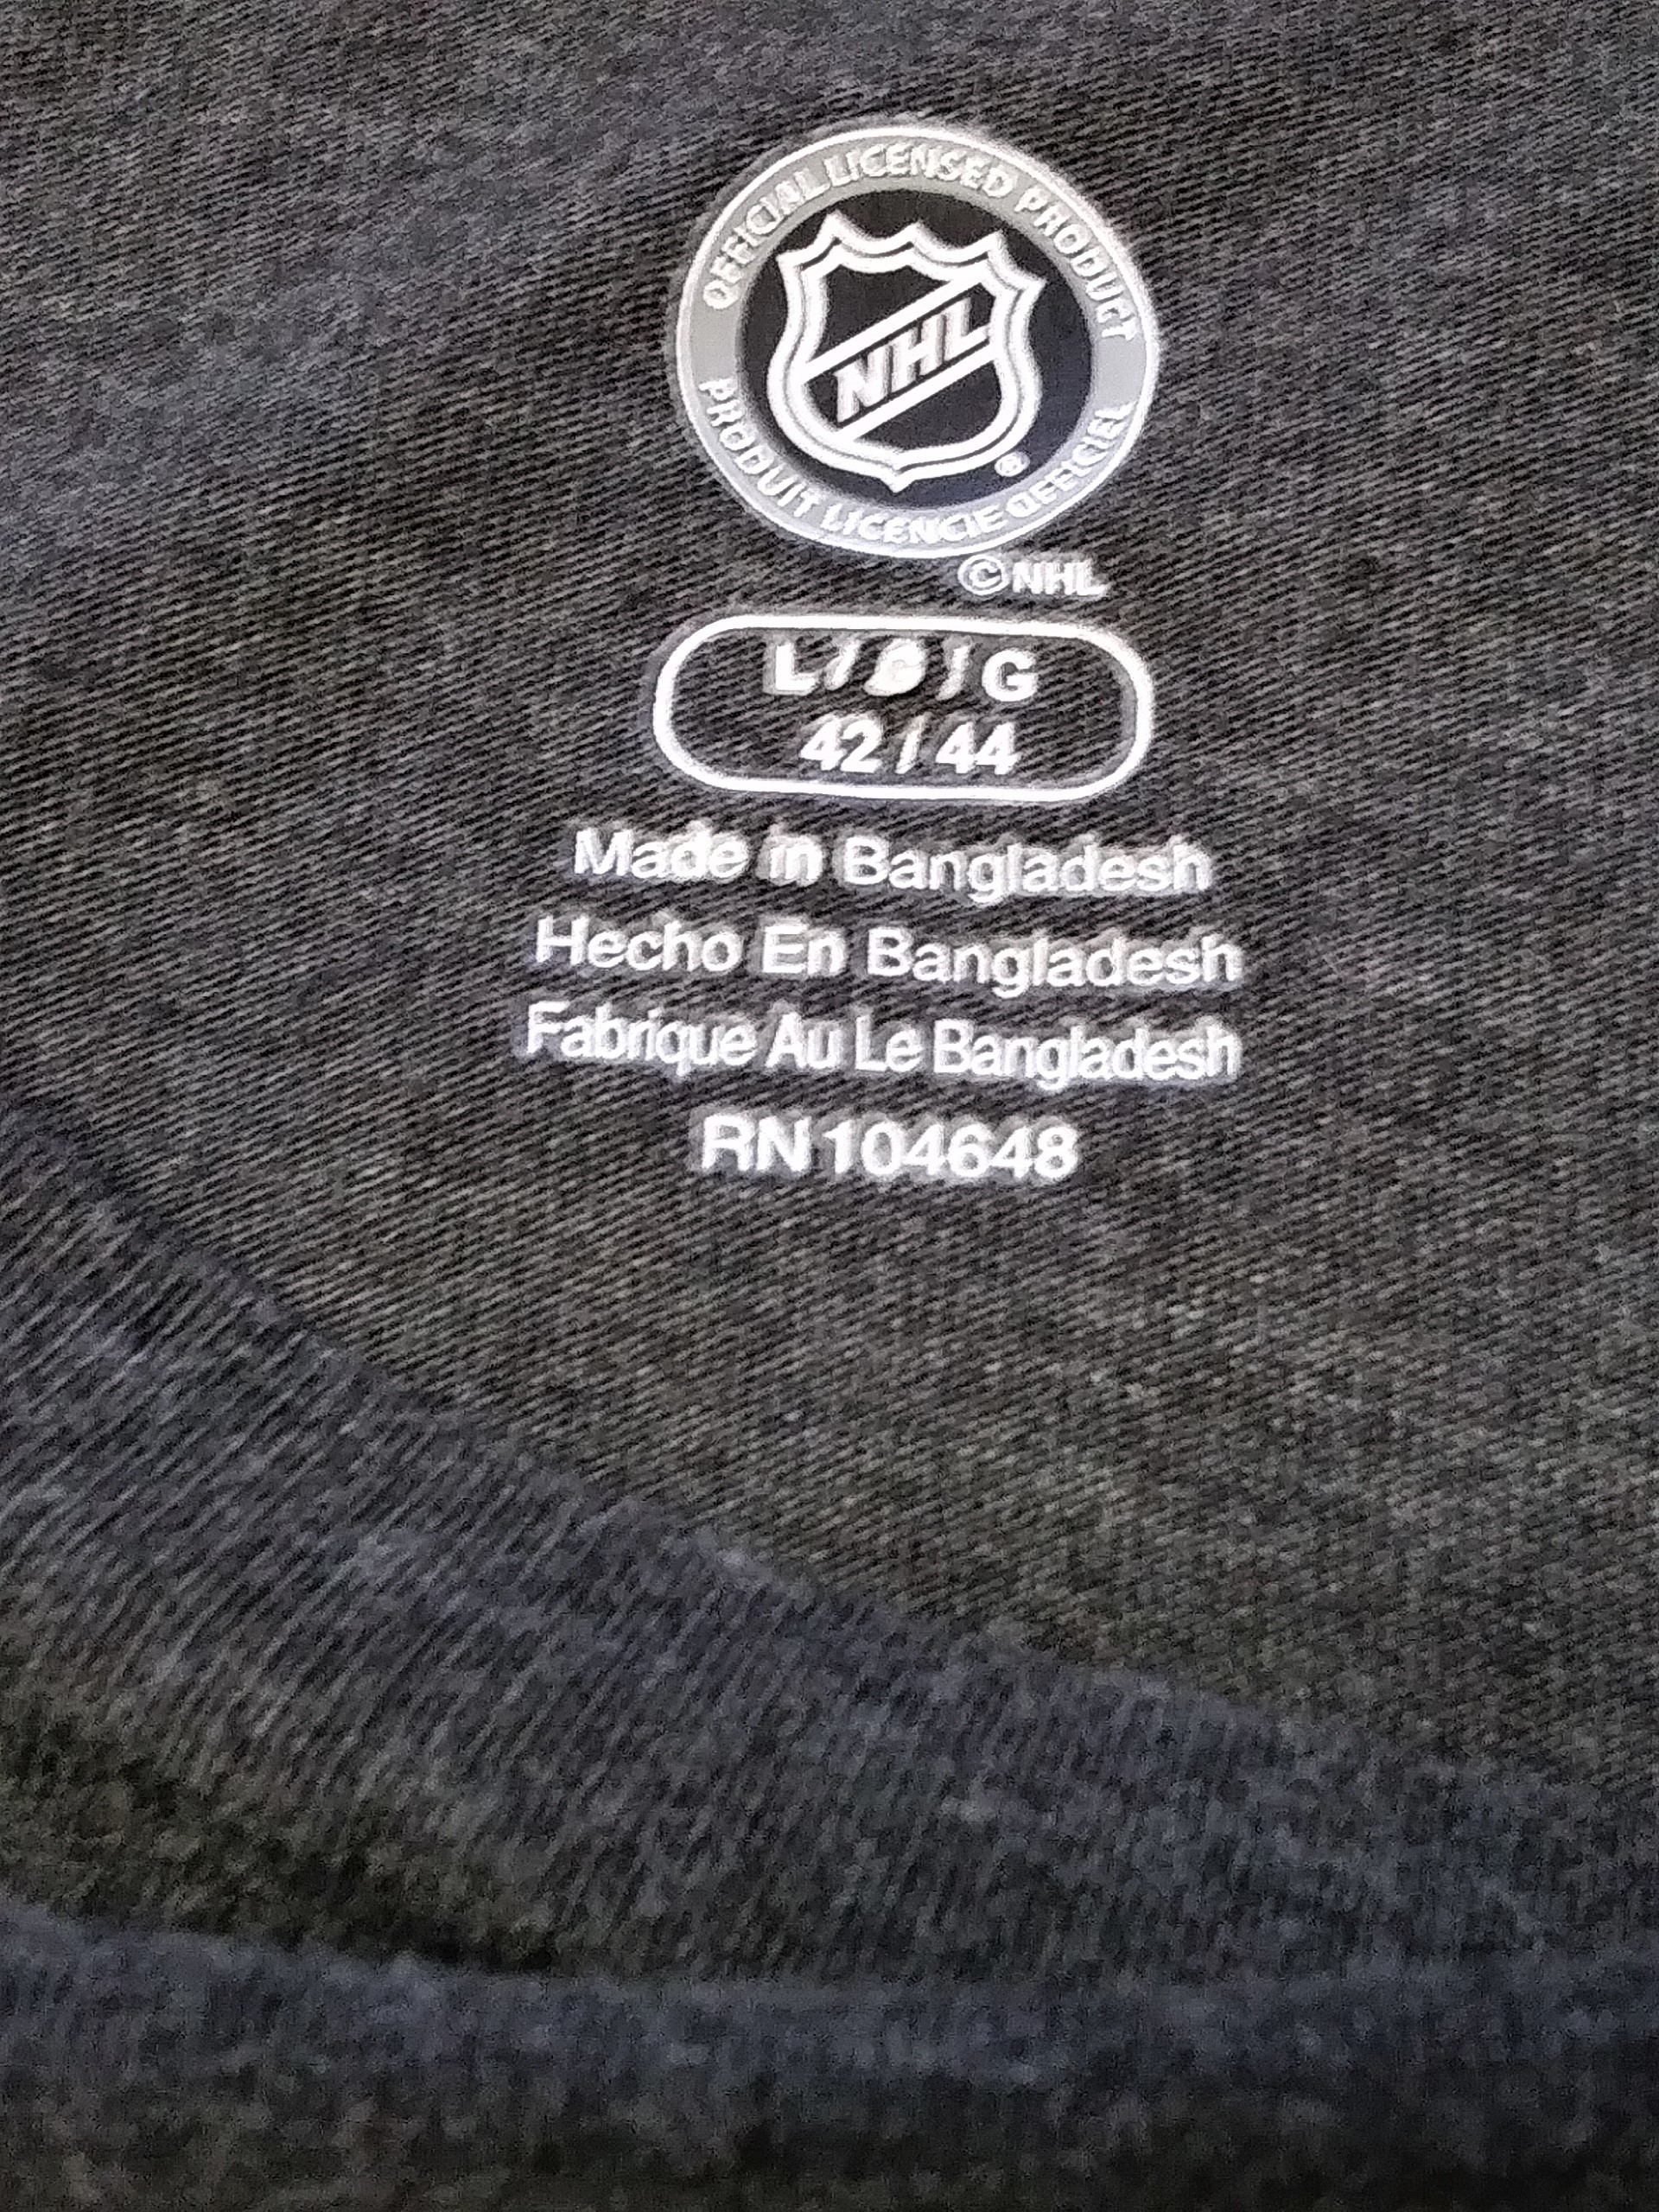 ... Knight s Apparel Charcoal Gray Detroit Red Wings T-Shirt Sz L 42-44 NHL  ... 1679b0a5c